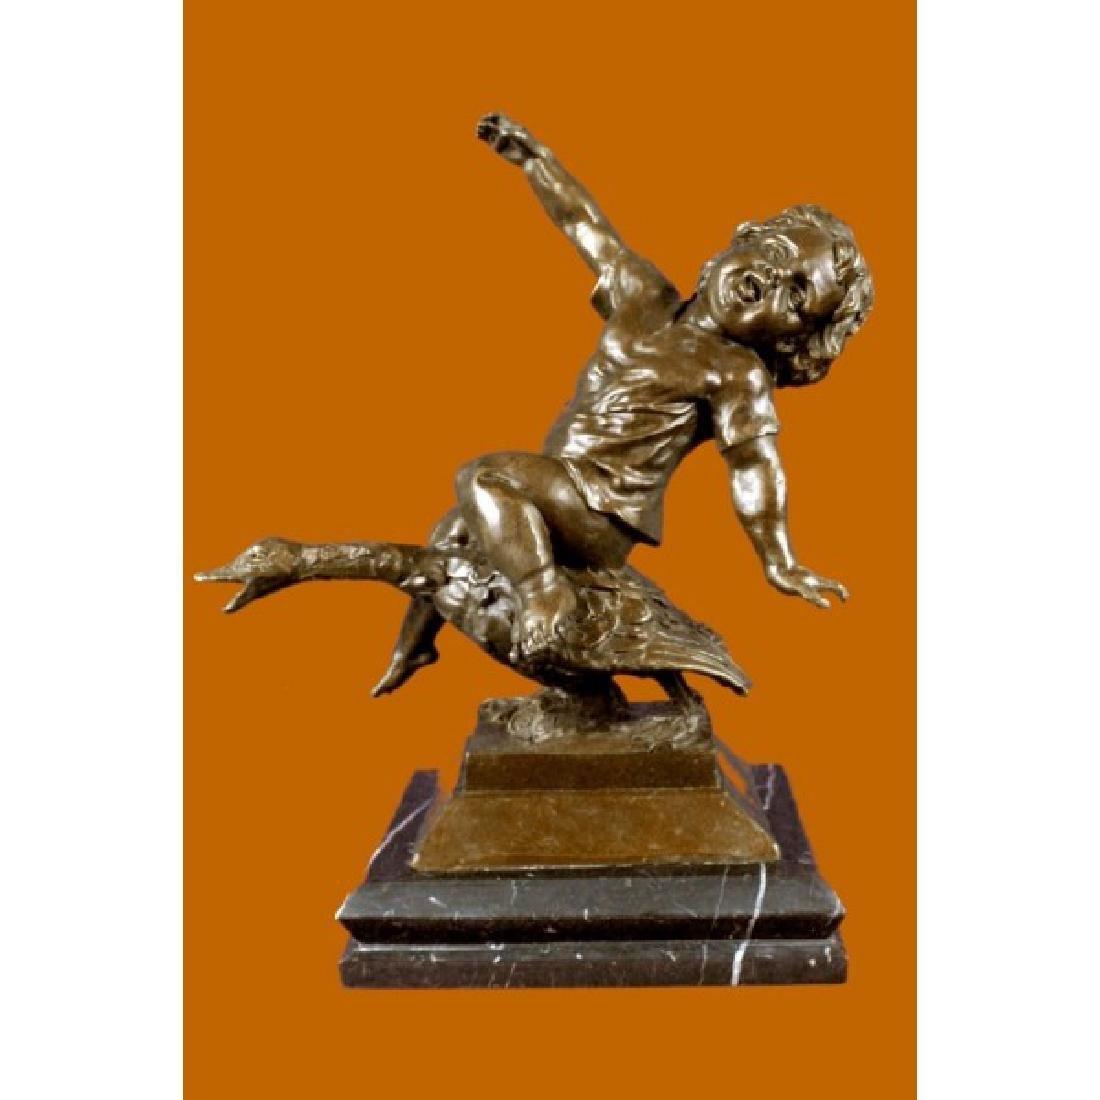 Young Girl Riding a Goose Bronze Sculpture Marble Base